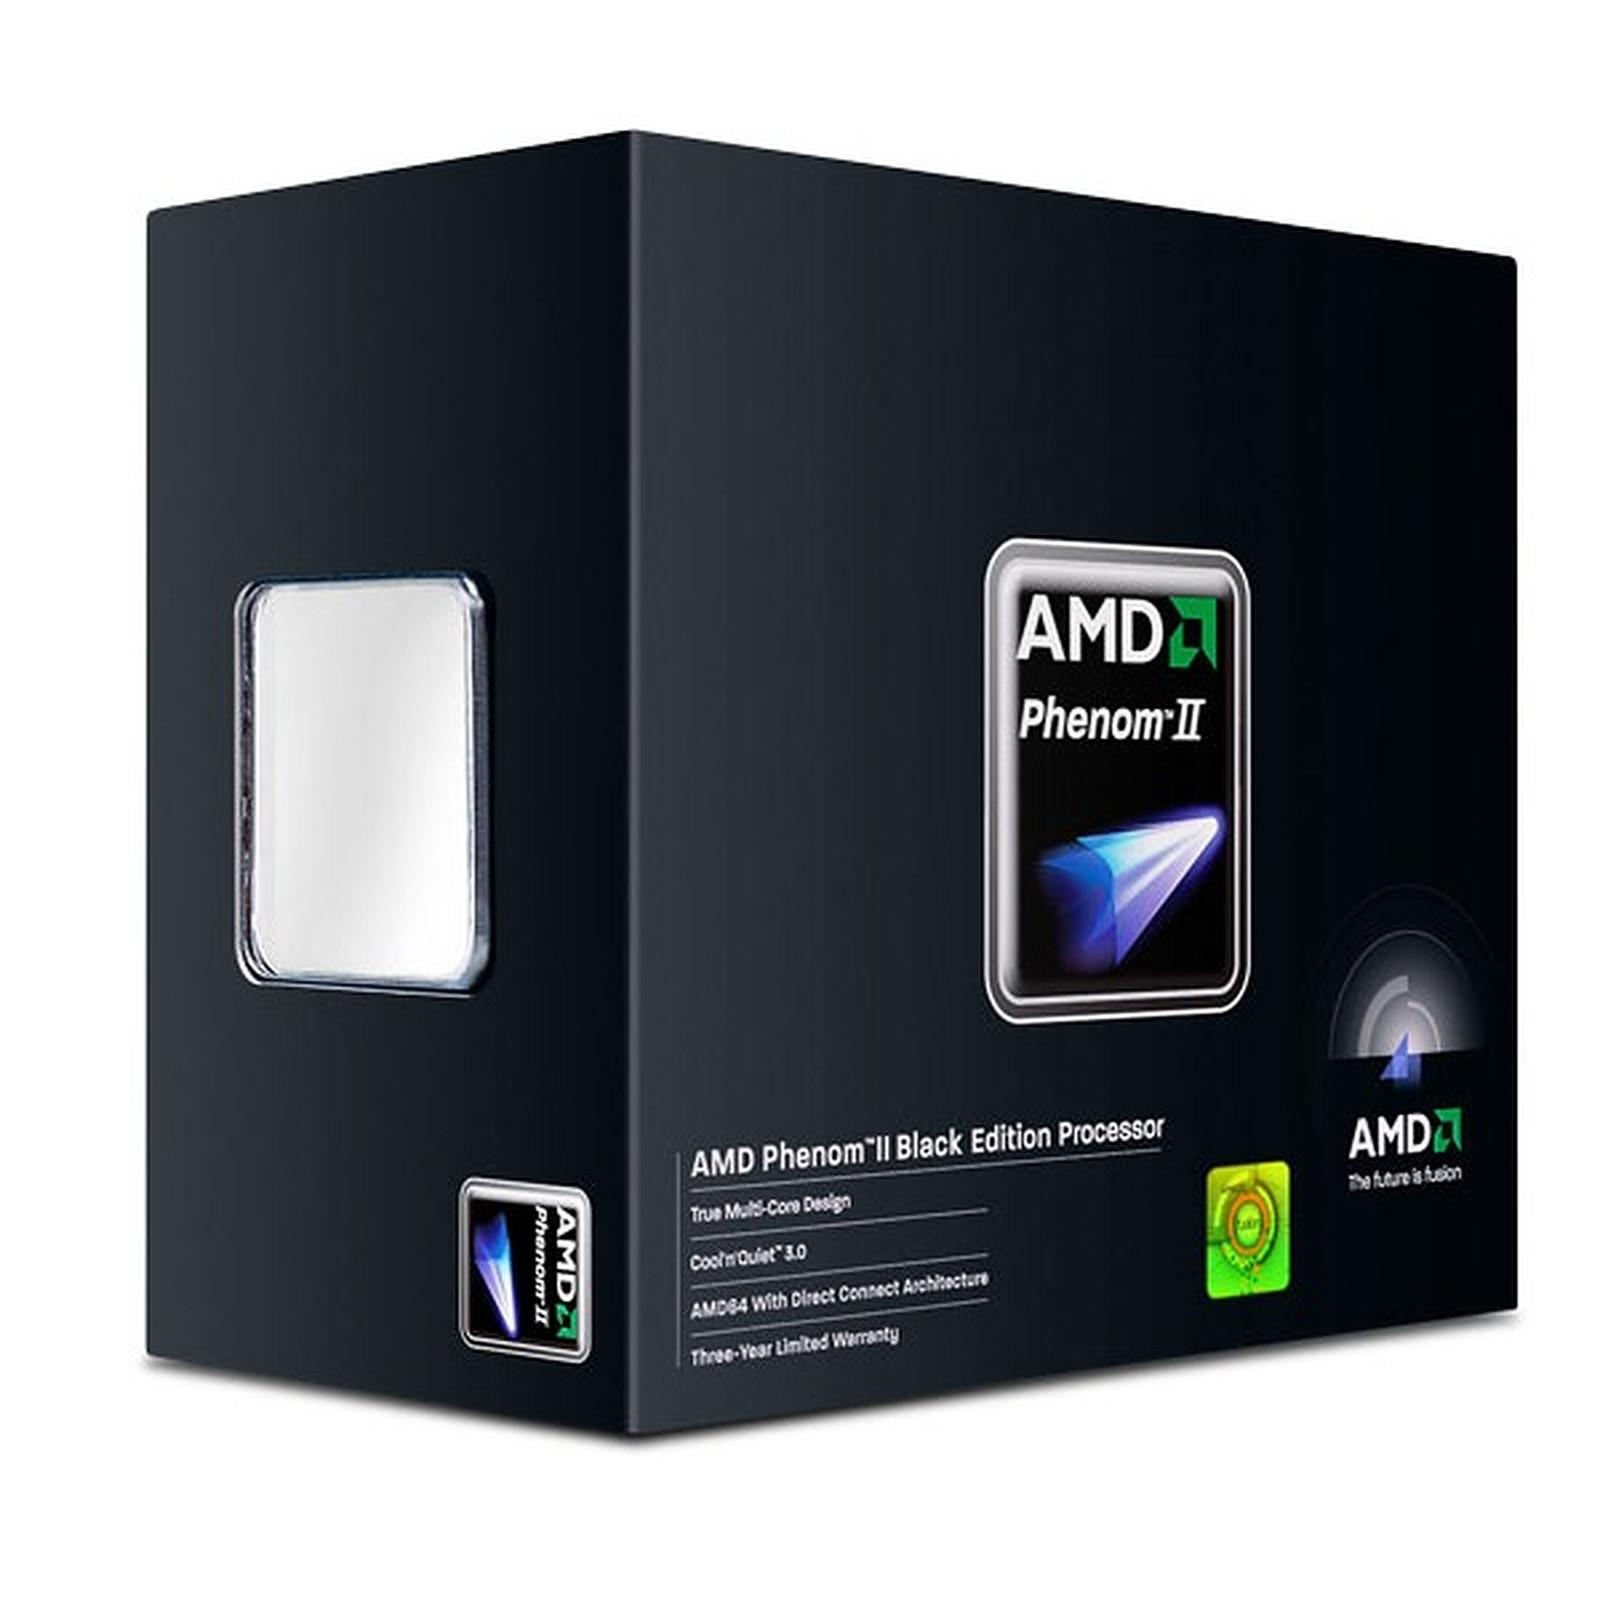 AMD Phenom II X6 1100T Black Edition (3.3 GHz)